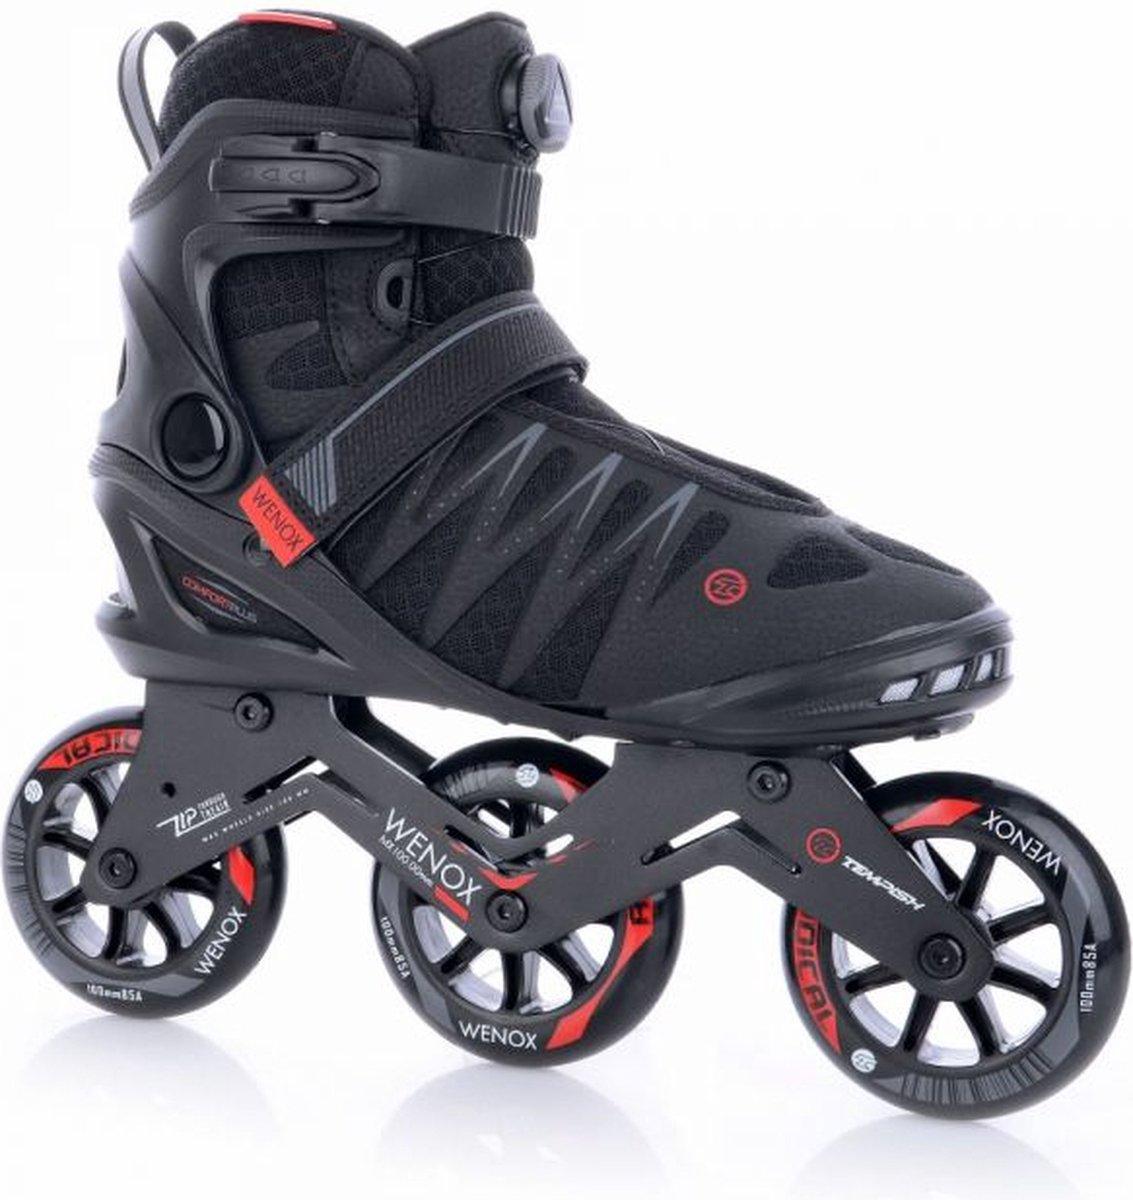 Tempish - Skeelers - Wenox - Top 100 - Zwart/Rood - Maat 44 - Heren - Skates